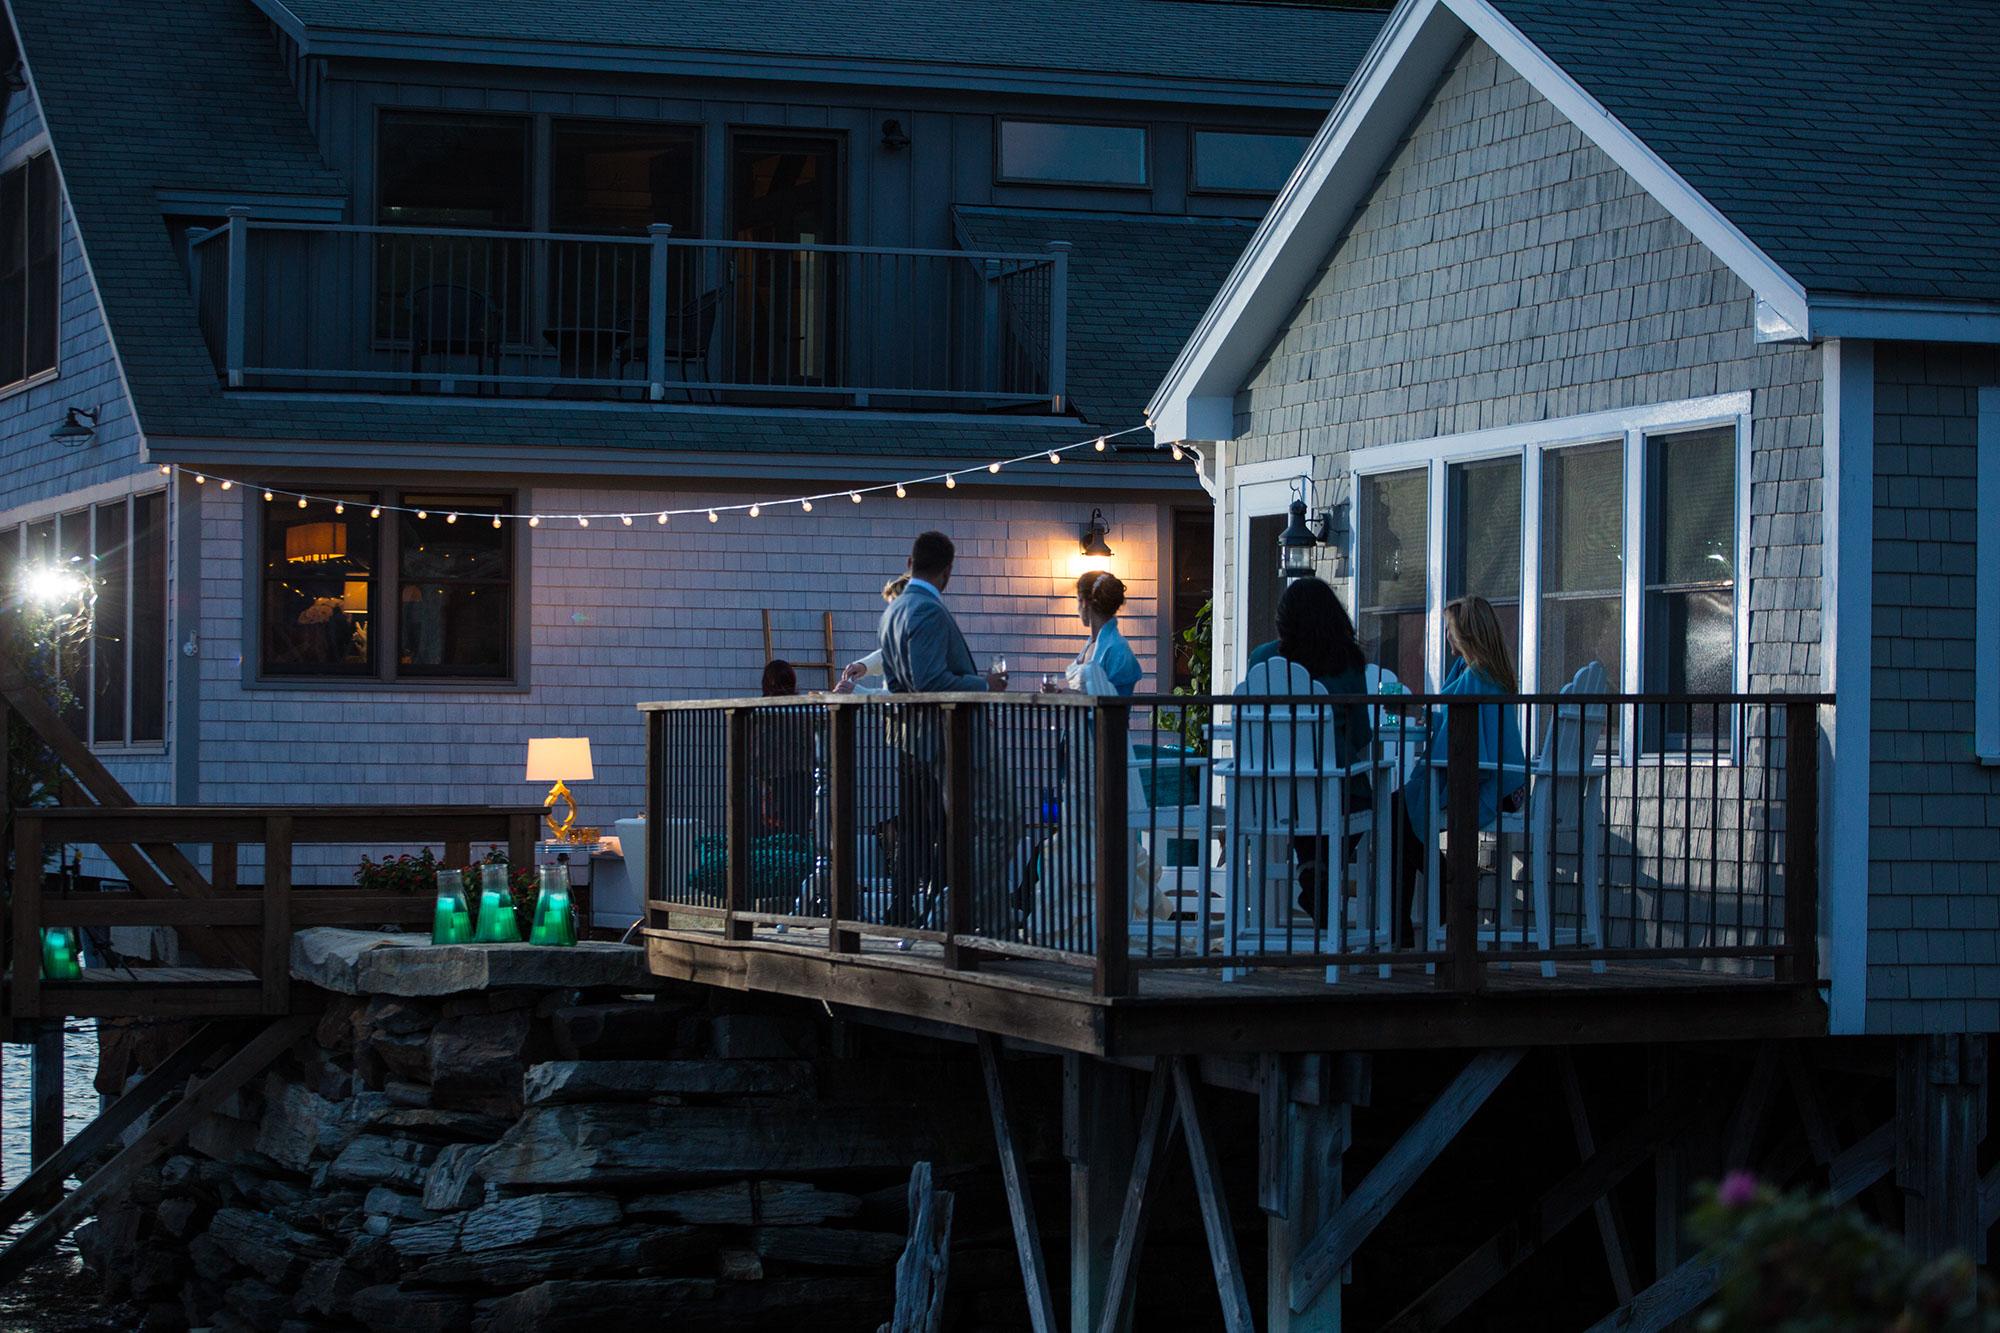 BoatHouse-205.jpg